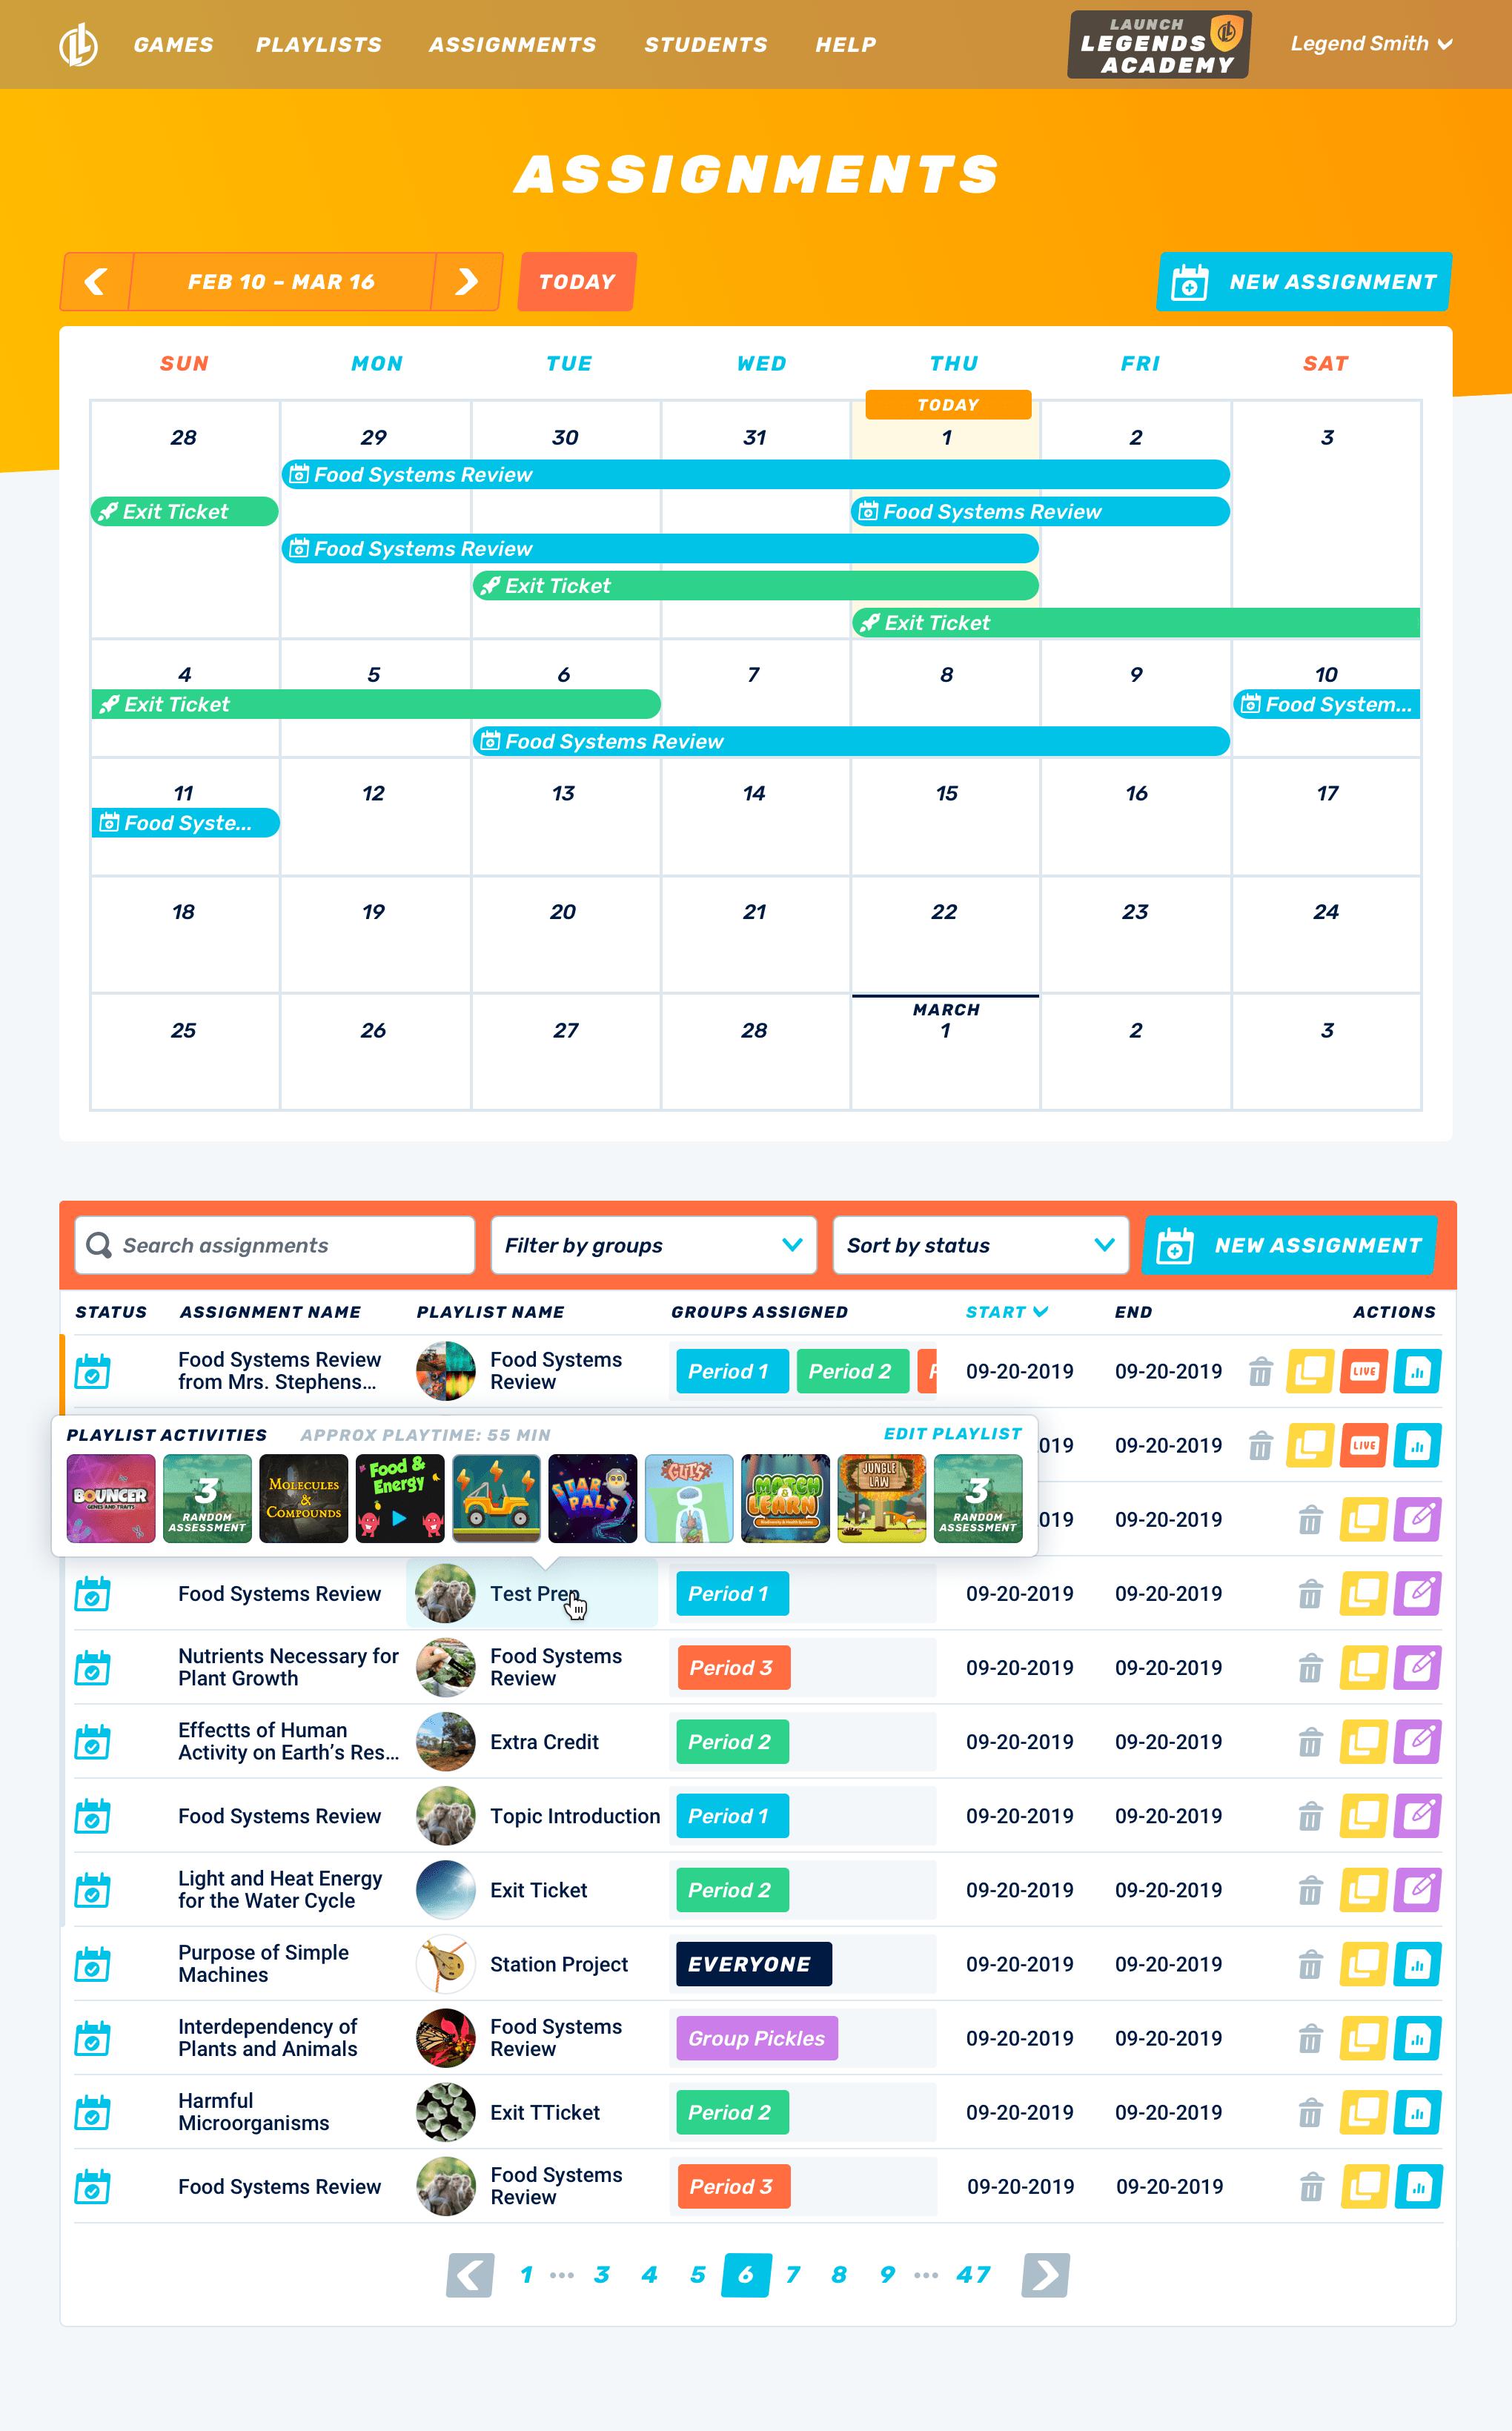 meng-he-legendsoflearning-Desktop-Playlist-calendar